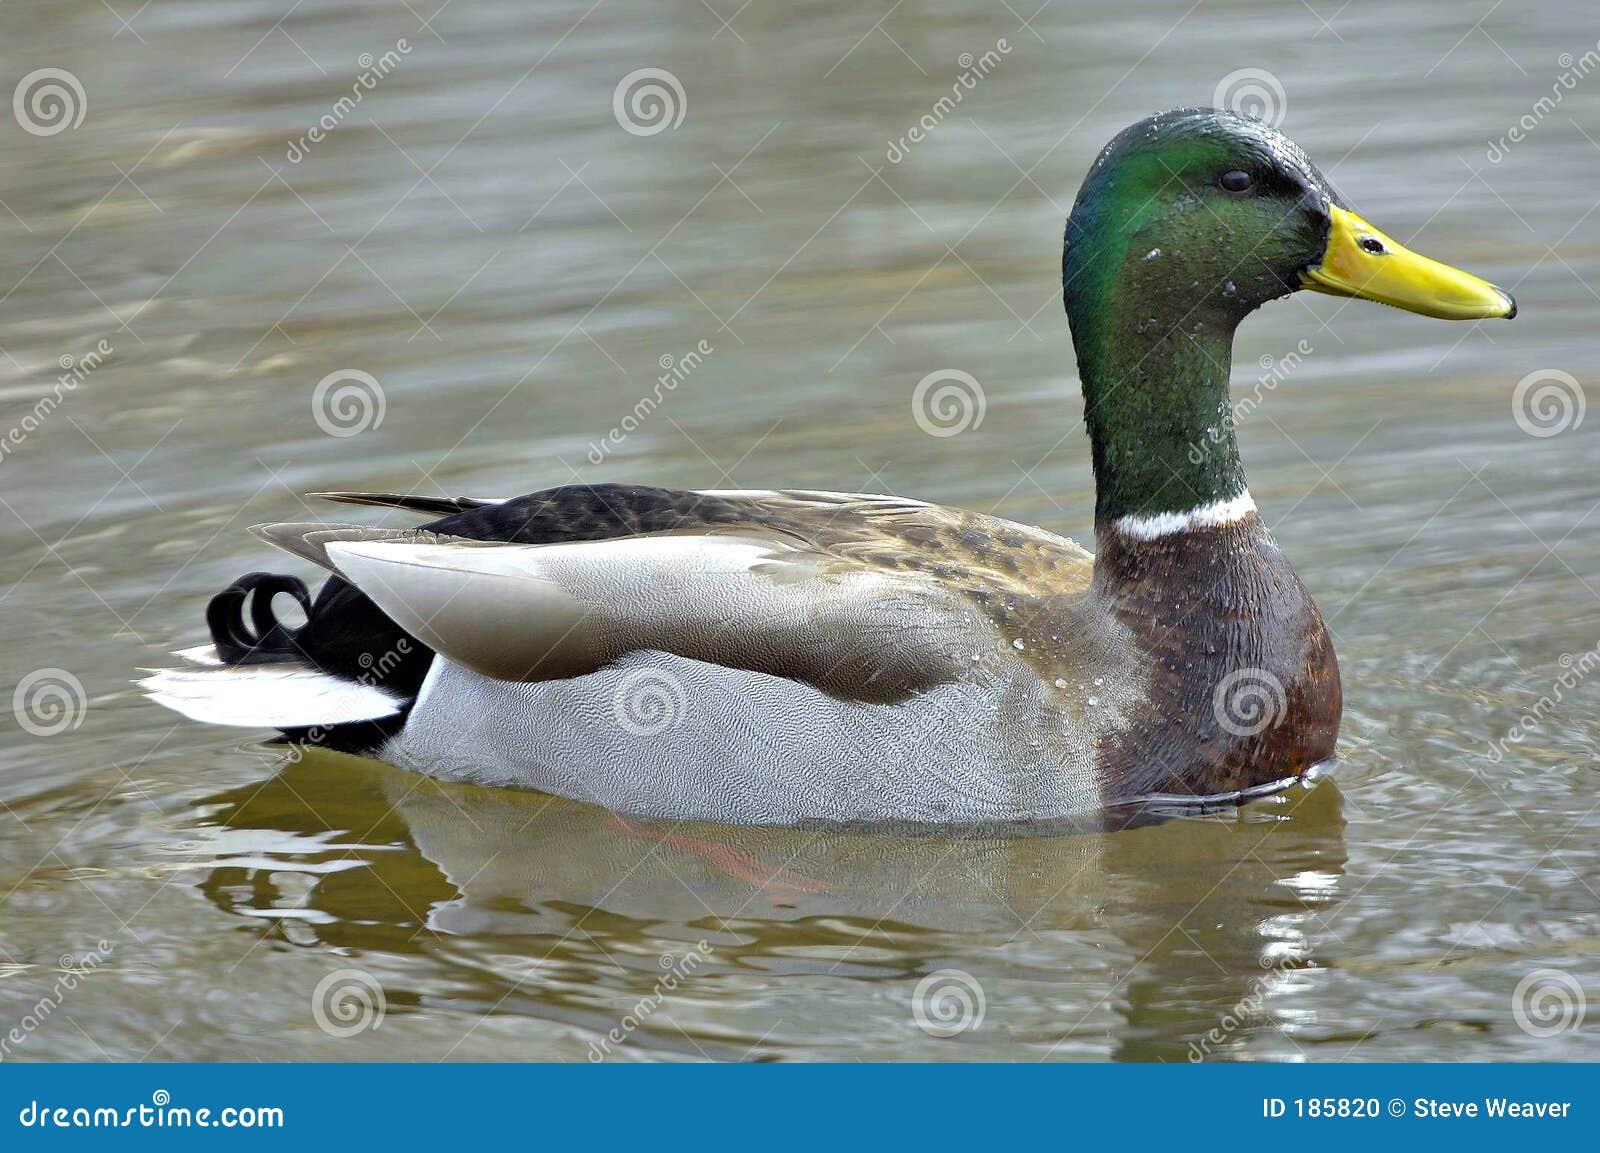 ducks swimming on the - photo #20